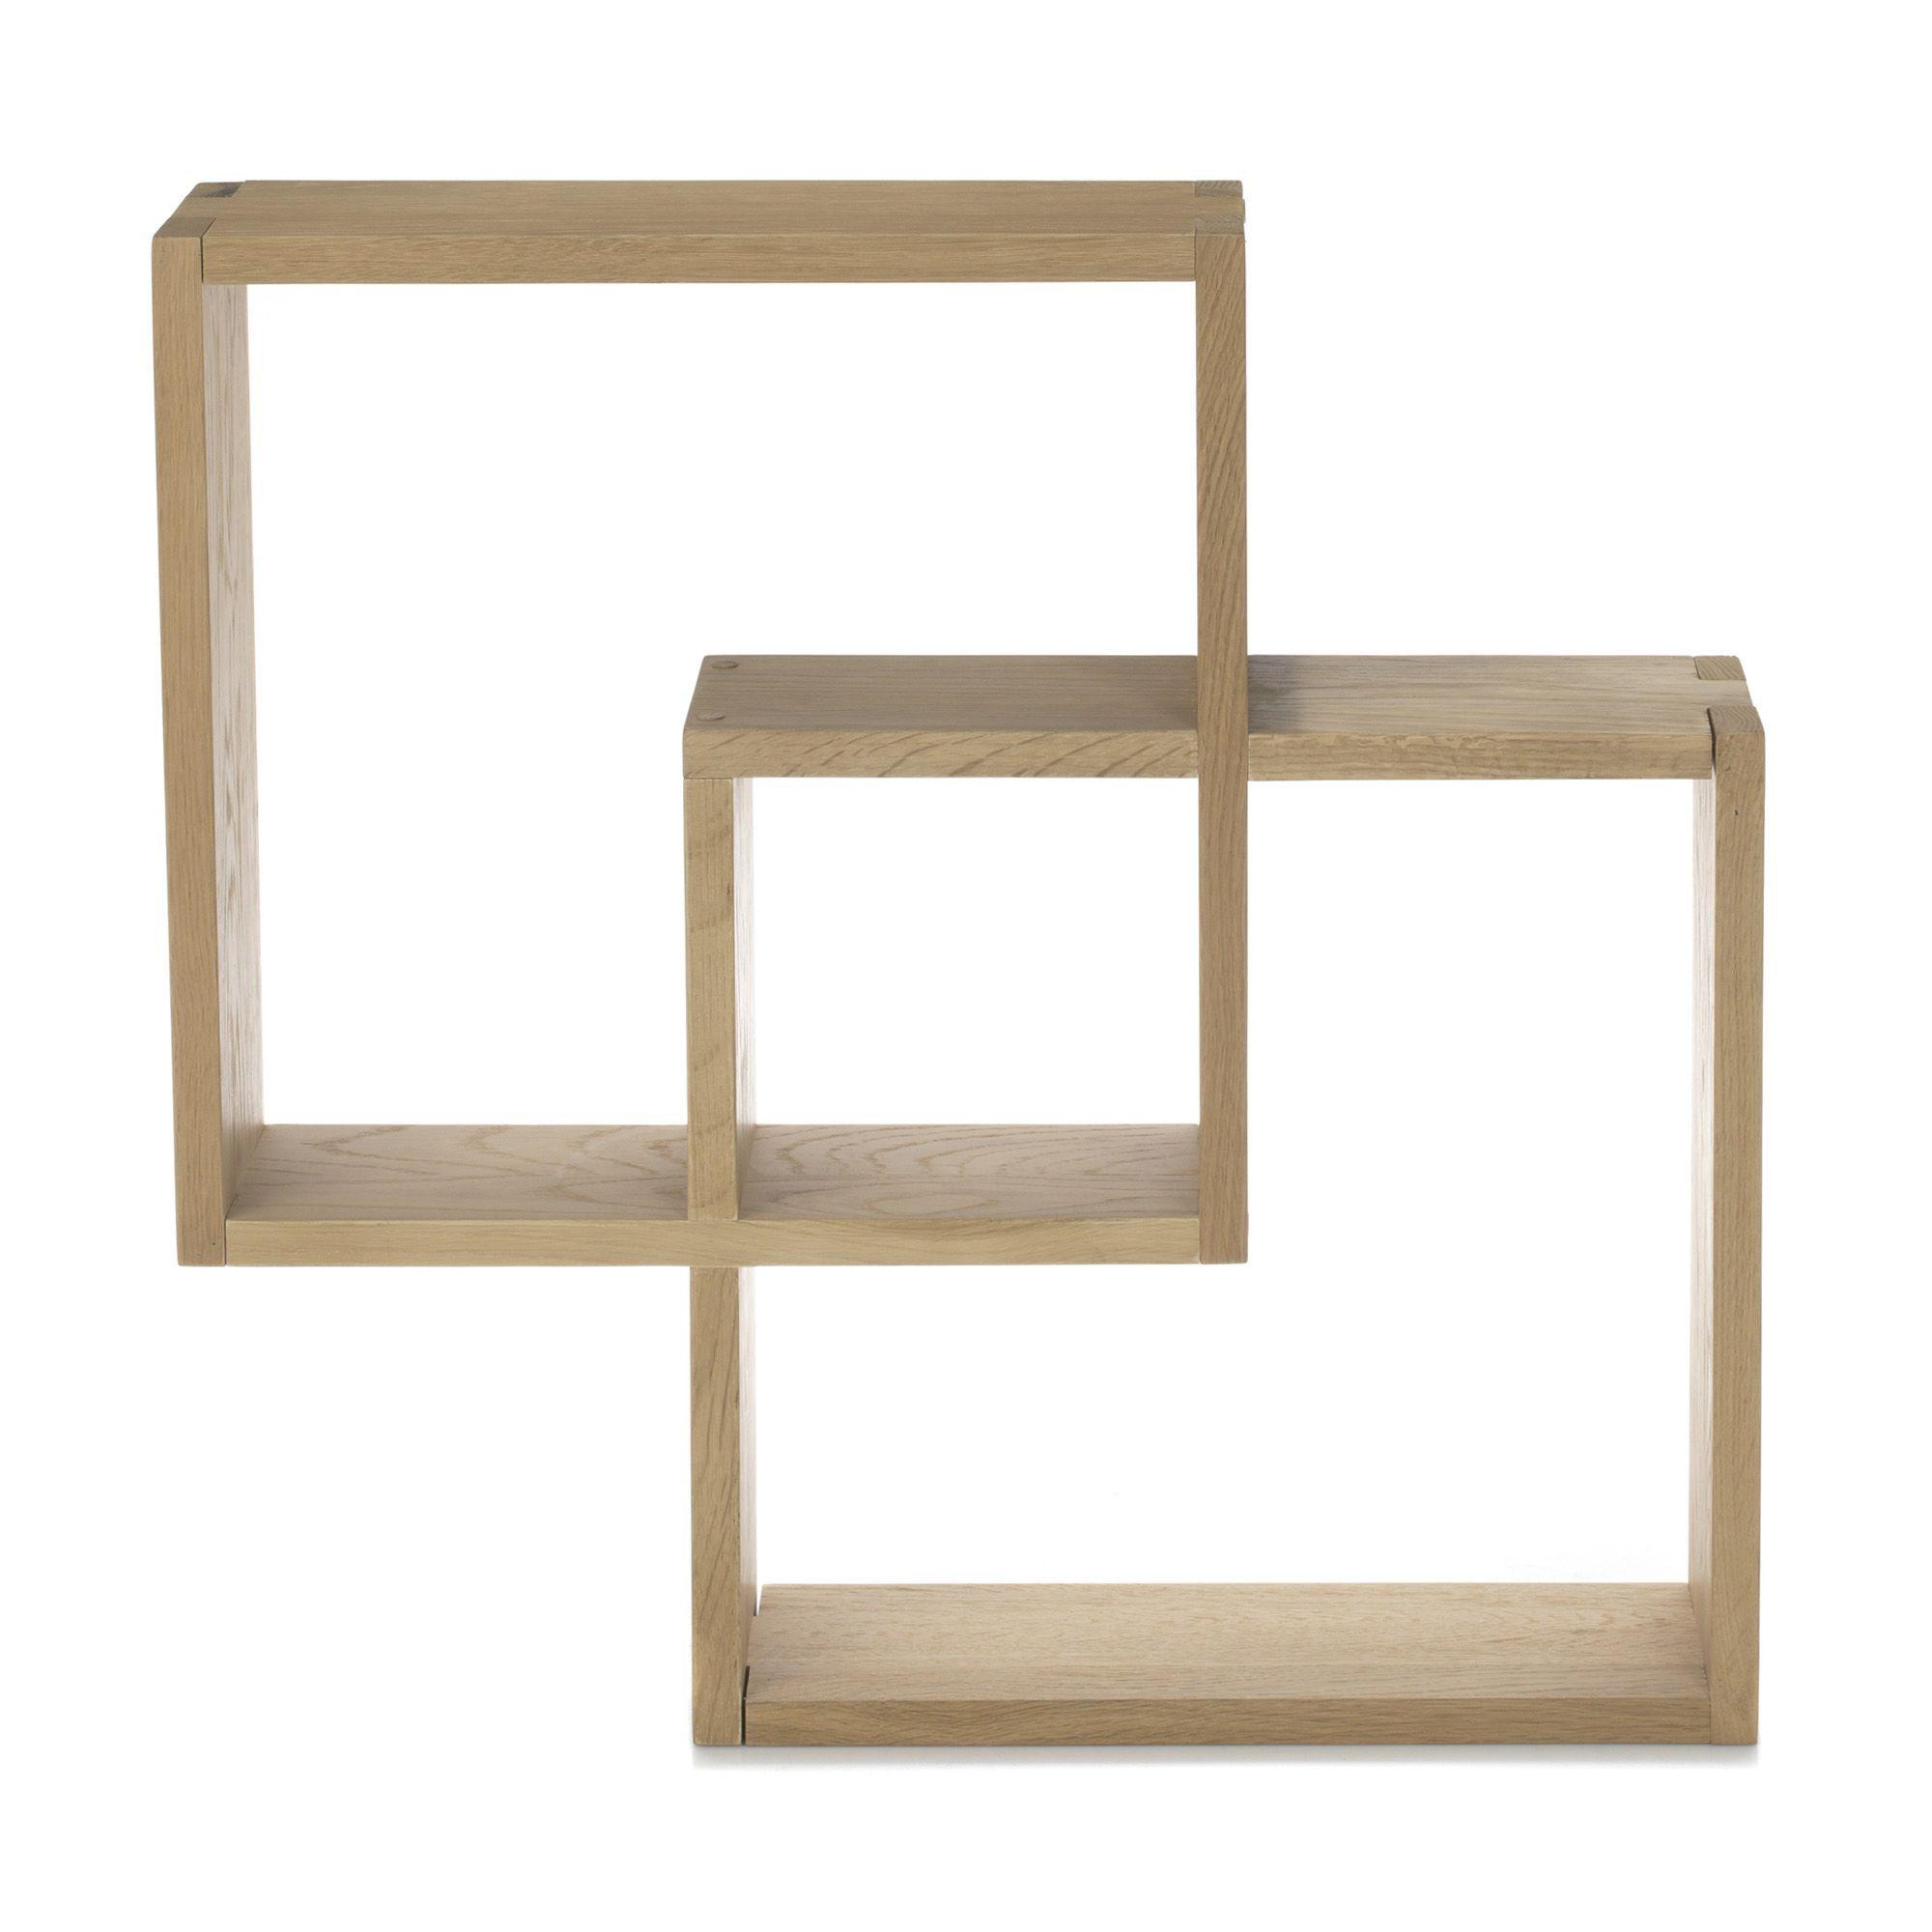 tag re cube murale en ch ne massif naturel tassia tag res livings et tag res de salon. Black Bedroom Furniture Sets. Home Design Ideas